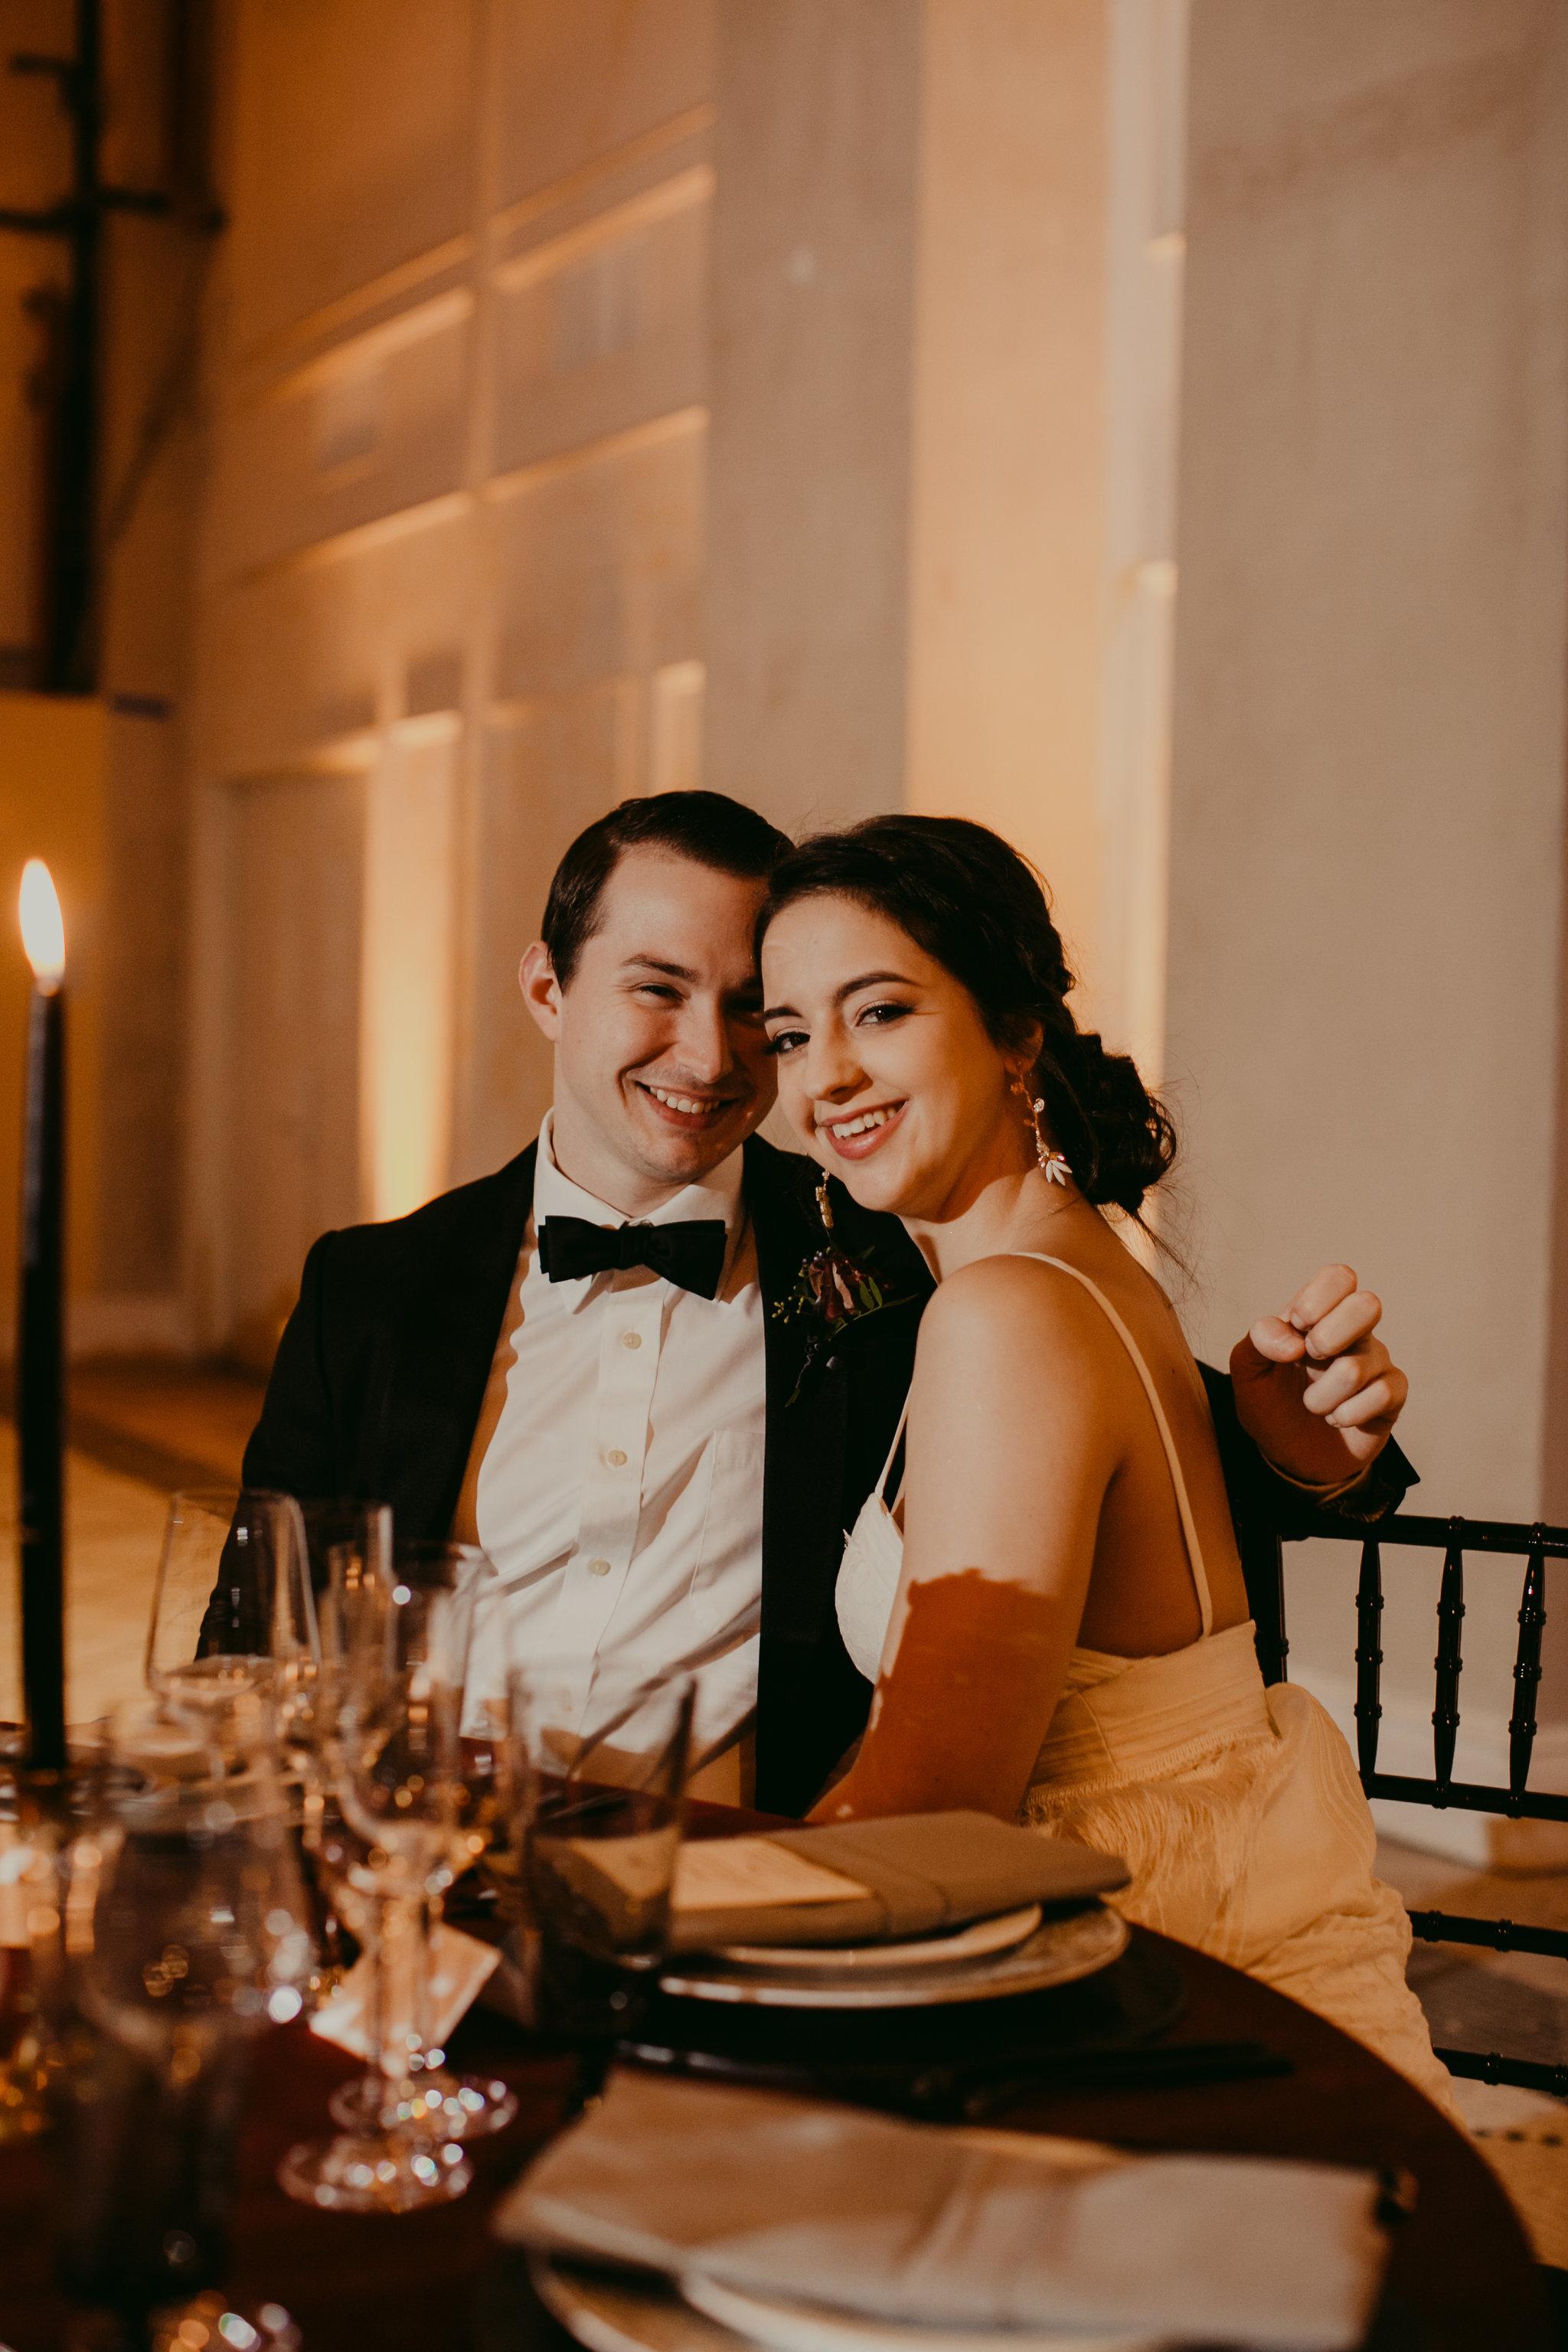 Williamsburg_Hotel_Wedding_Photographer_Chellise_Michael_Photography-257.jpg